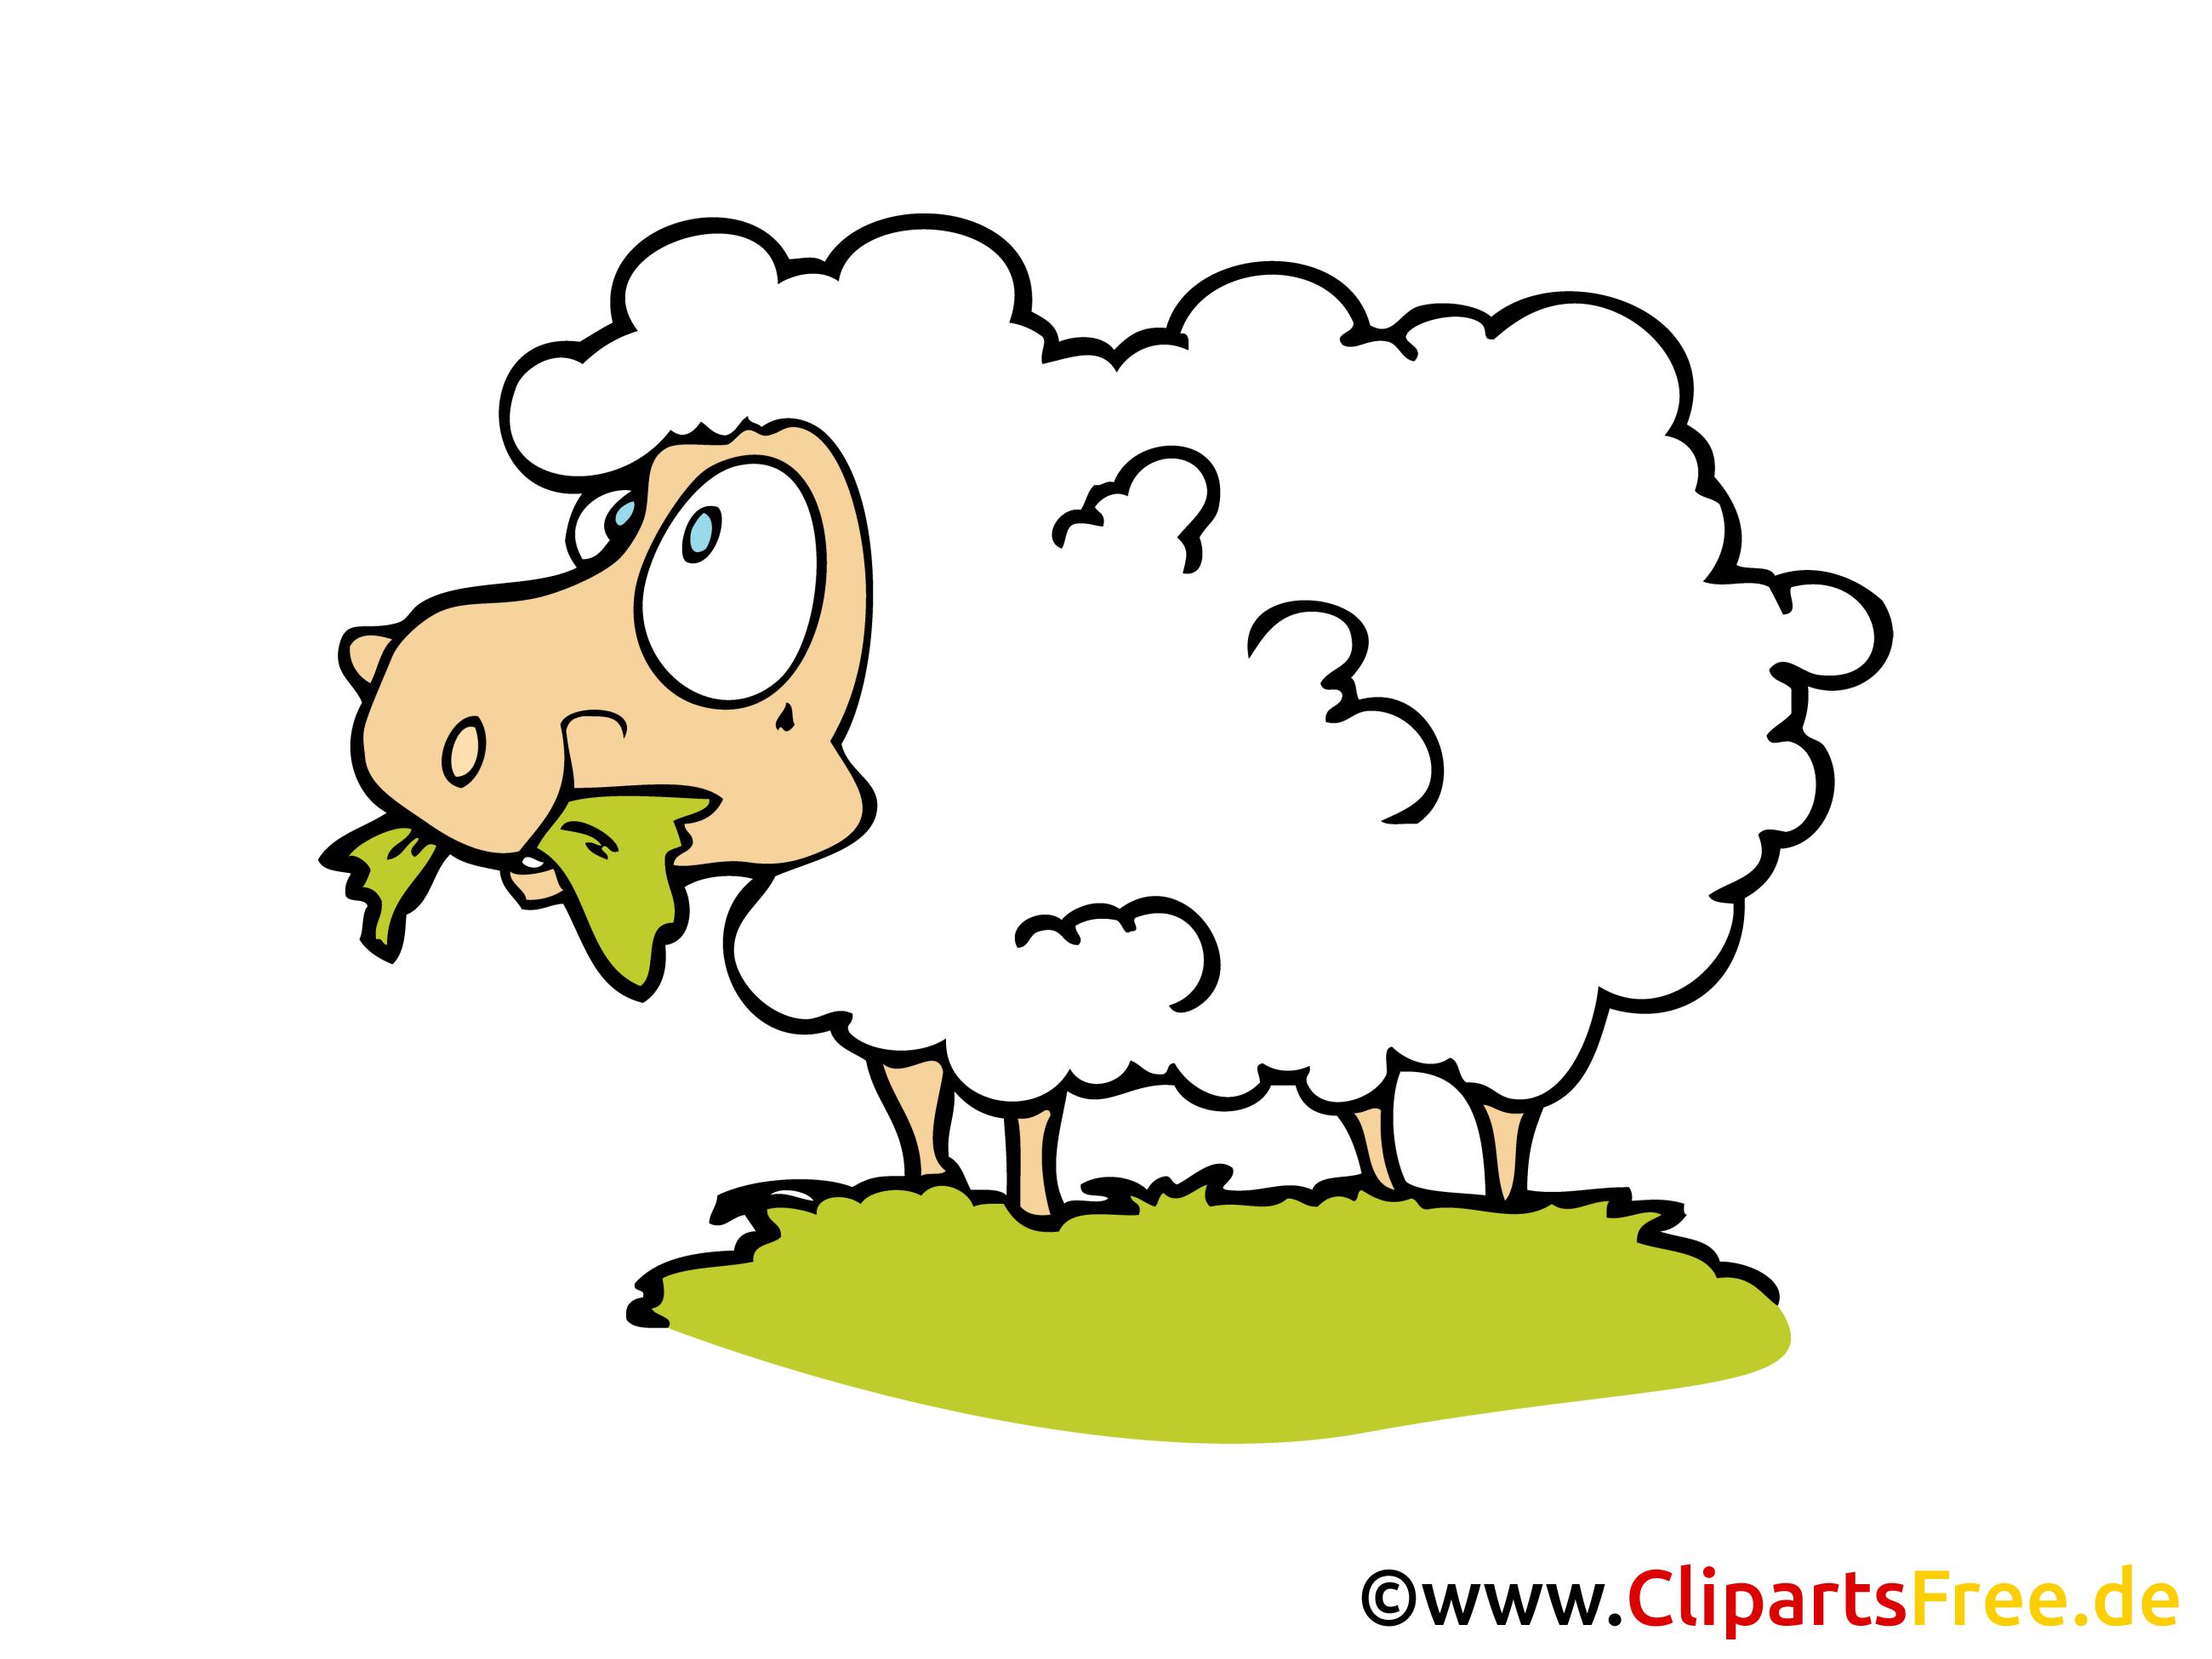 Sheep Clip Art, Image, Pic free